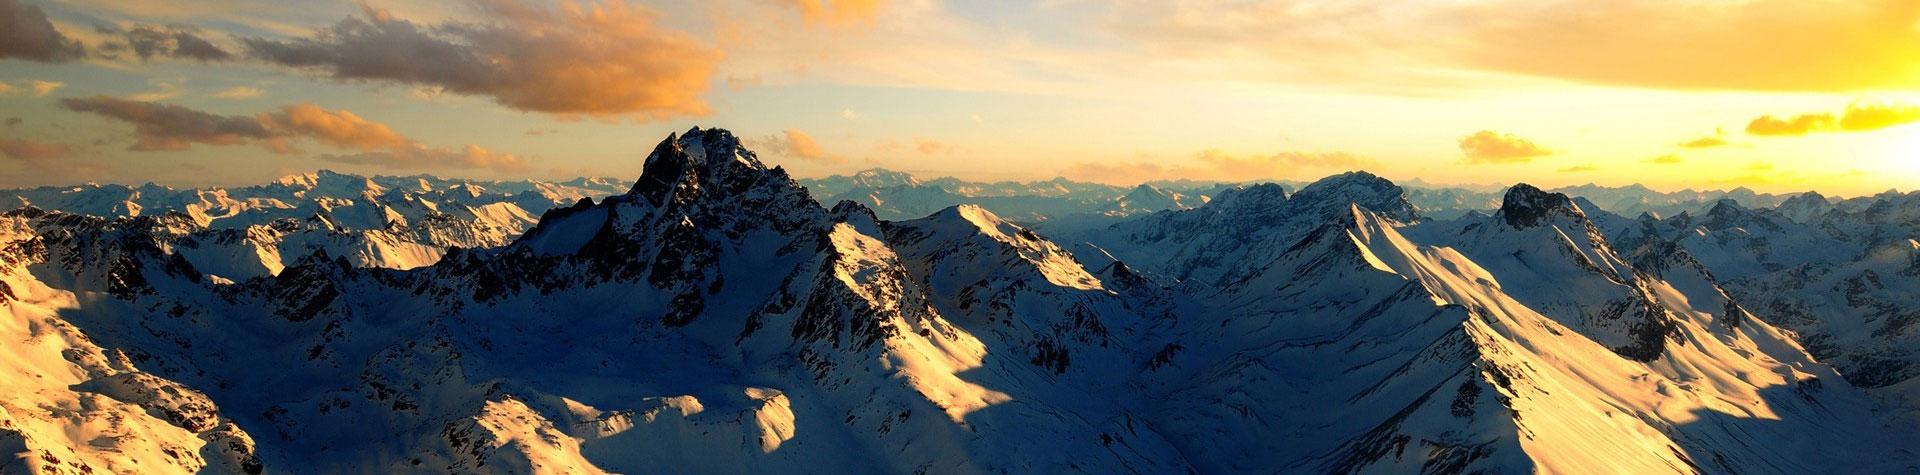 guide alpine torino header